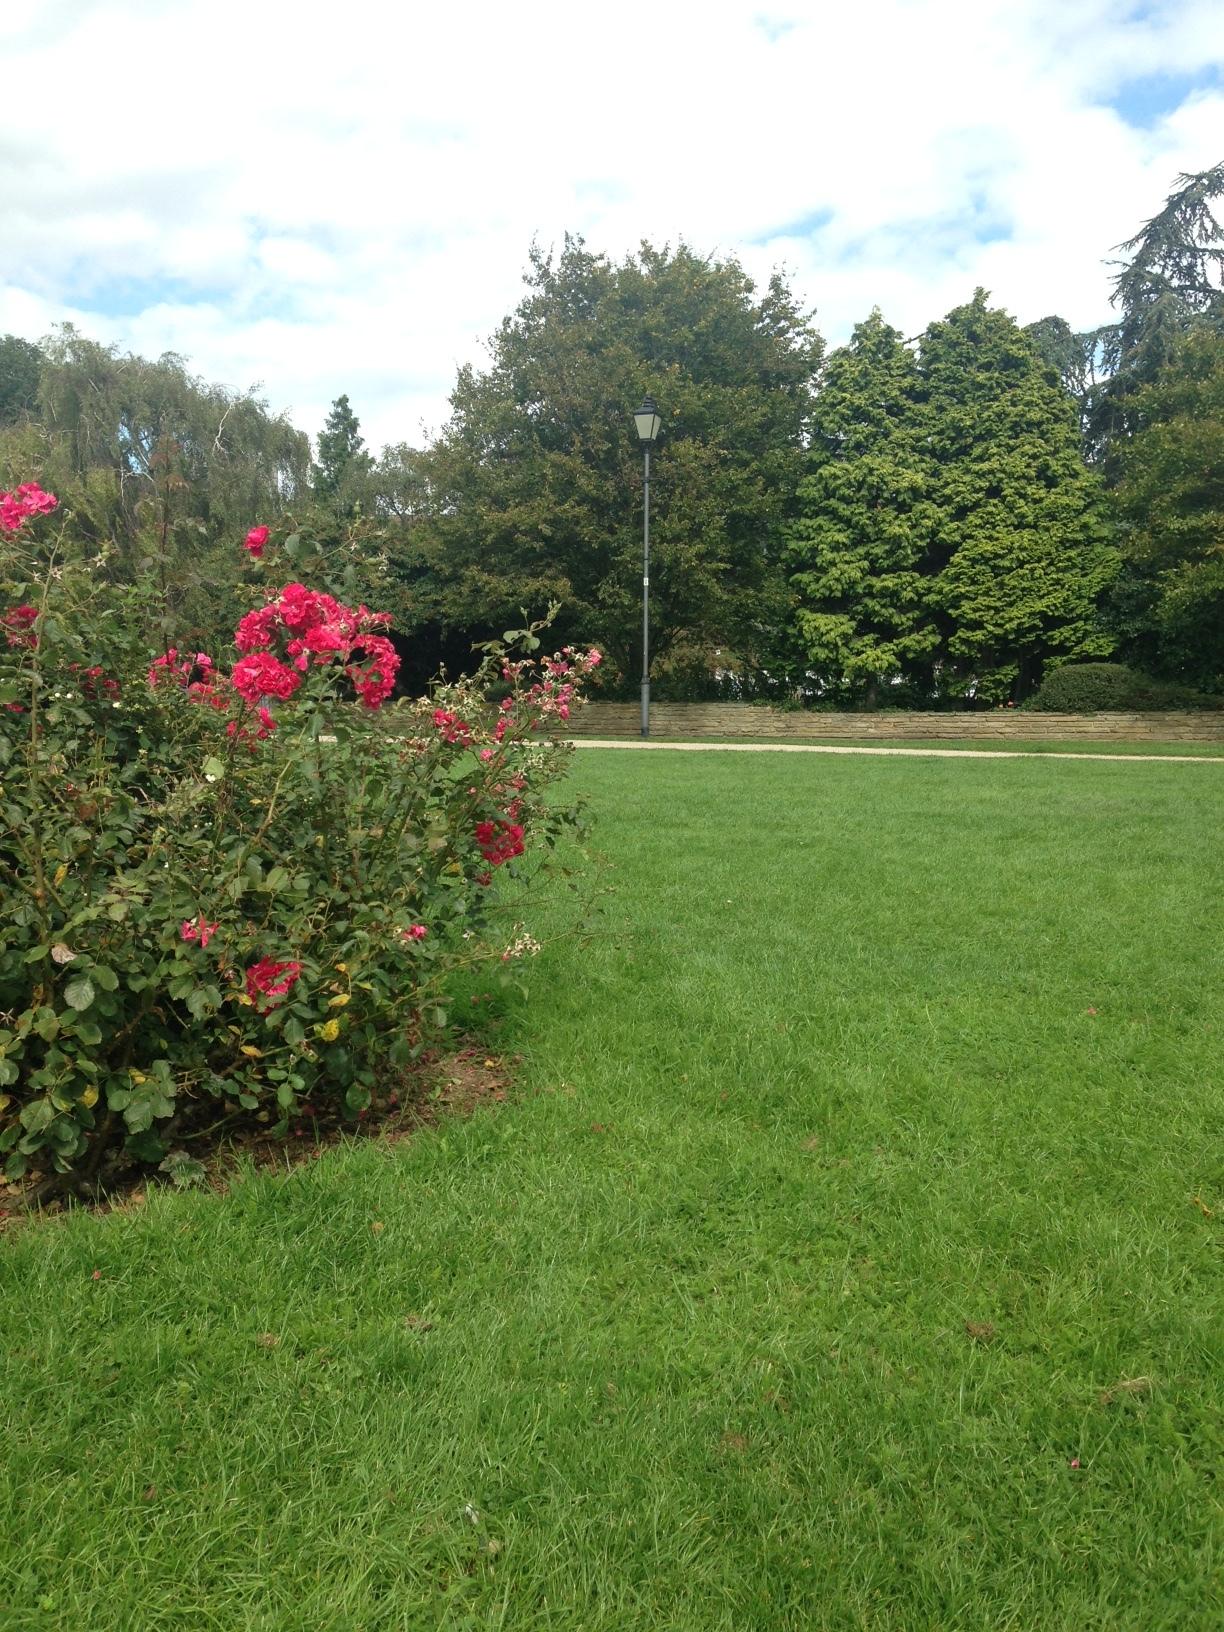 ^  Furnivall Park - a nice picnic spot.